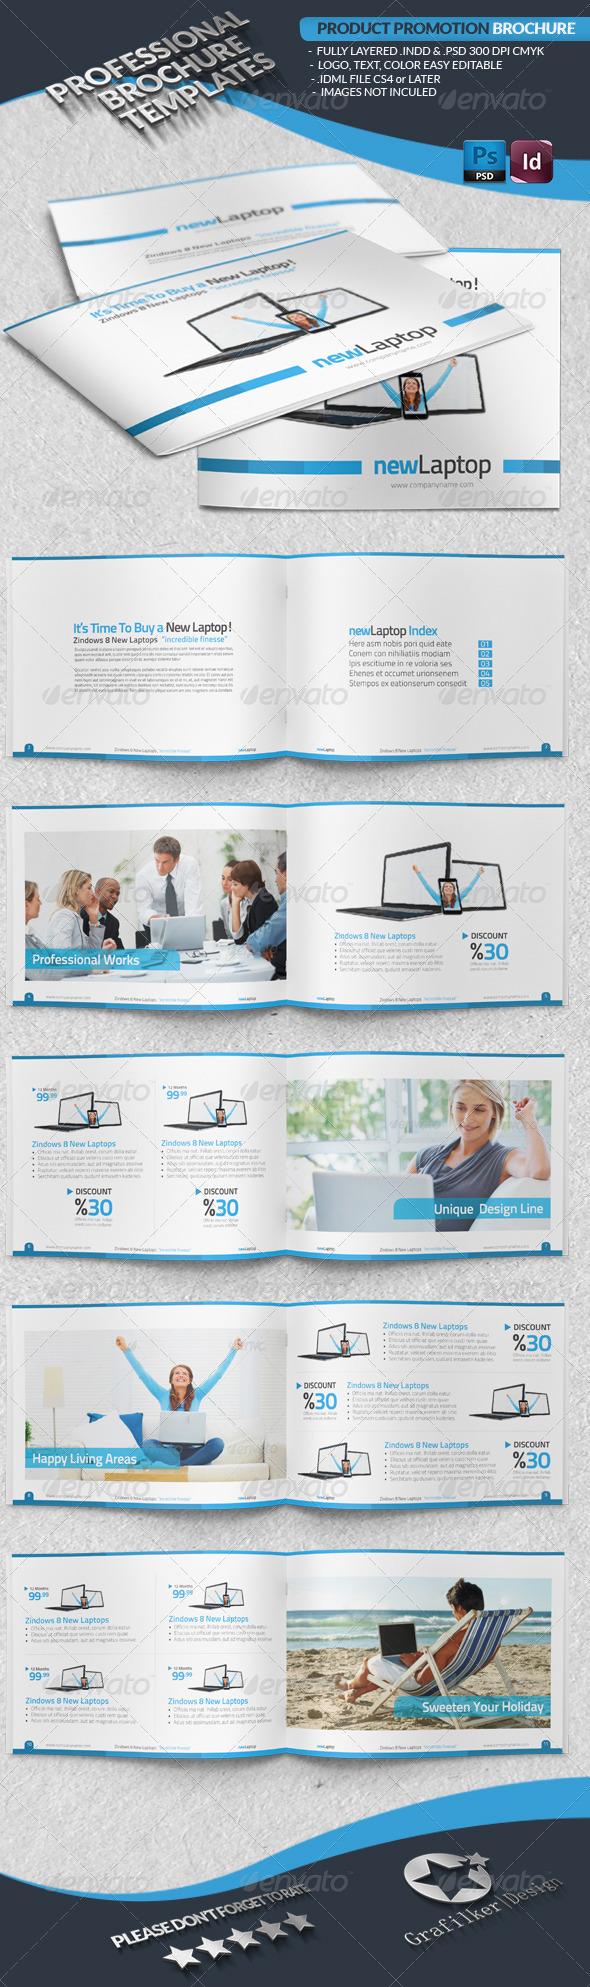 Product Promotion Brochure - Brochures Print Templates